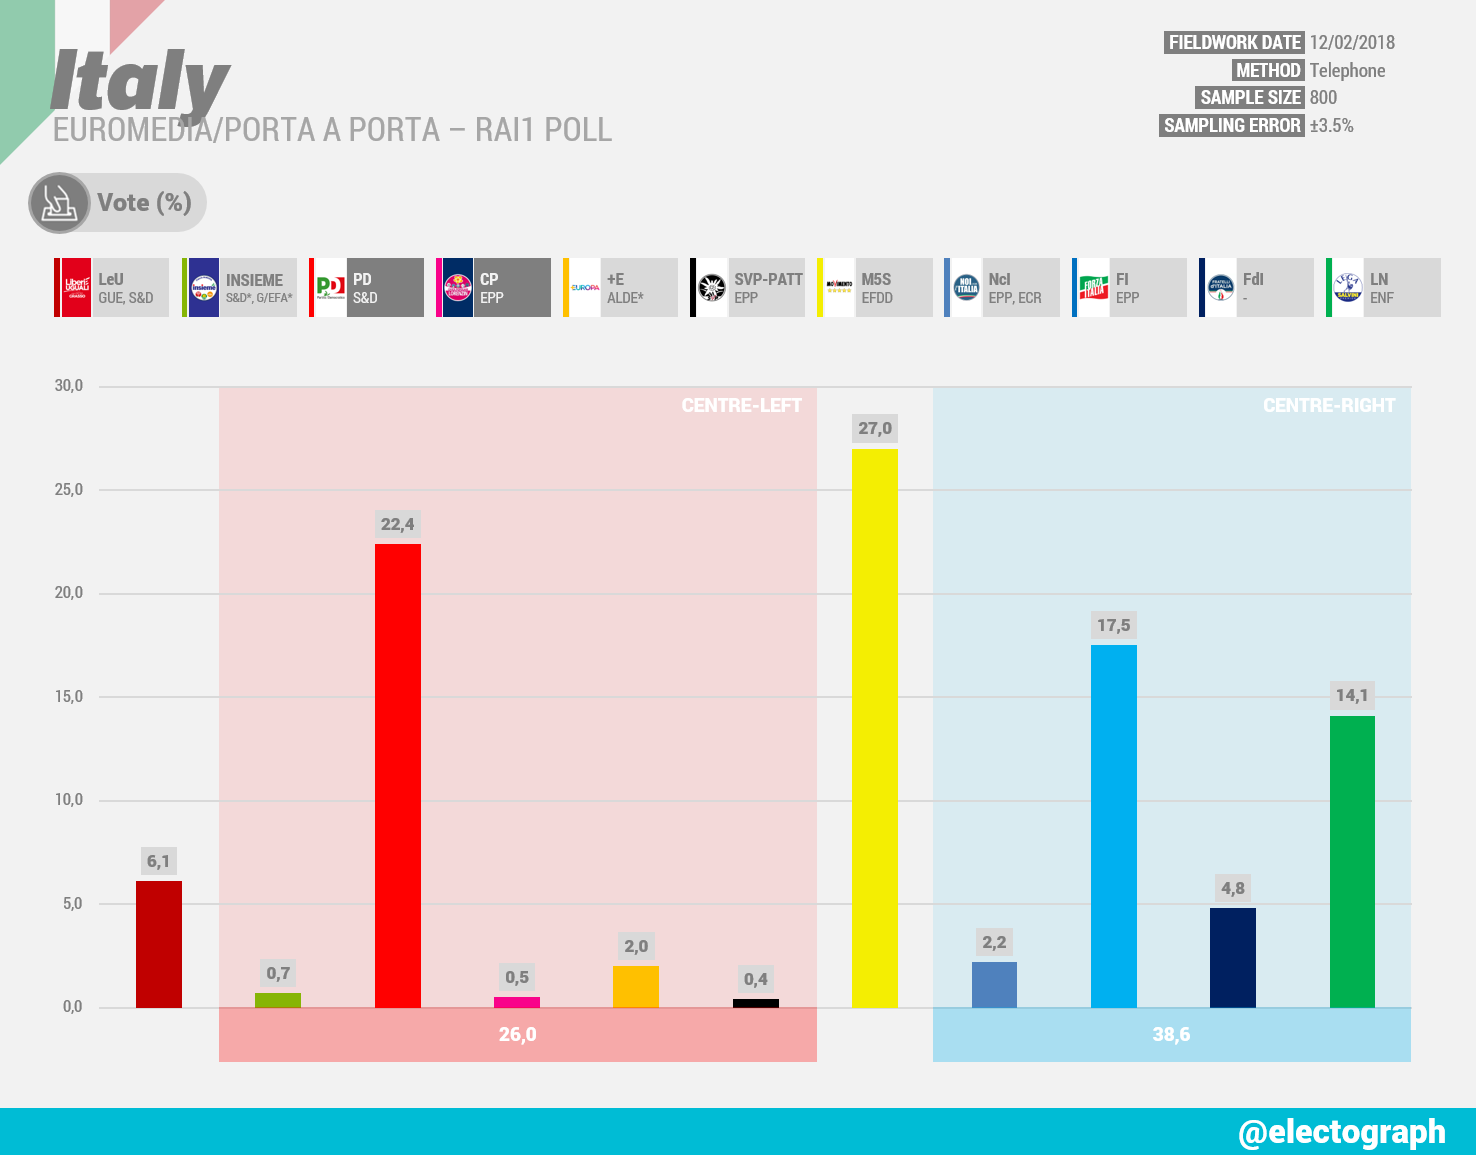 ITALY Euromedia poll chart for Porta a Porta - Rai1, February 2018